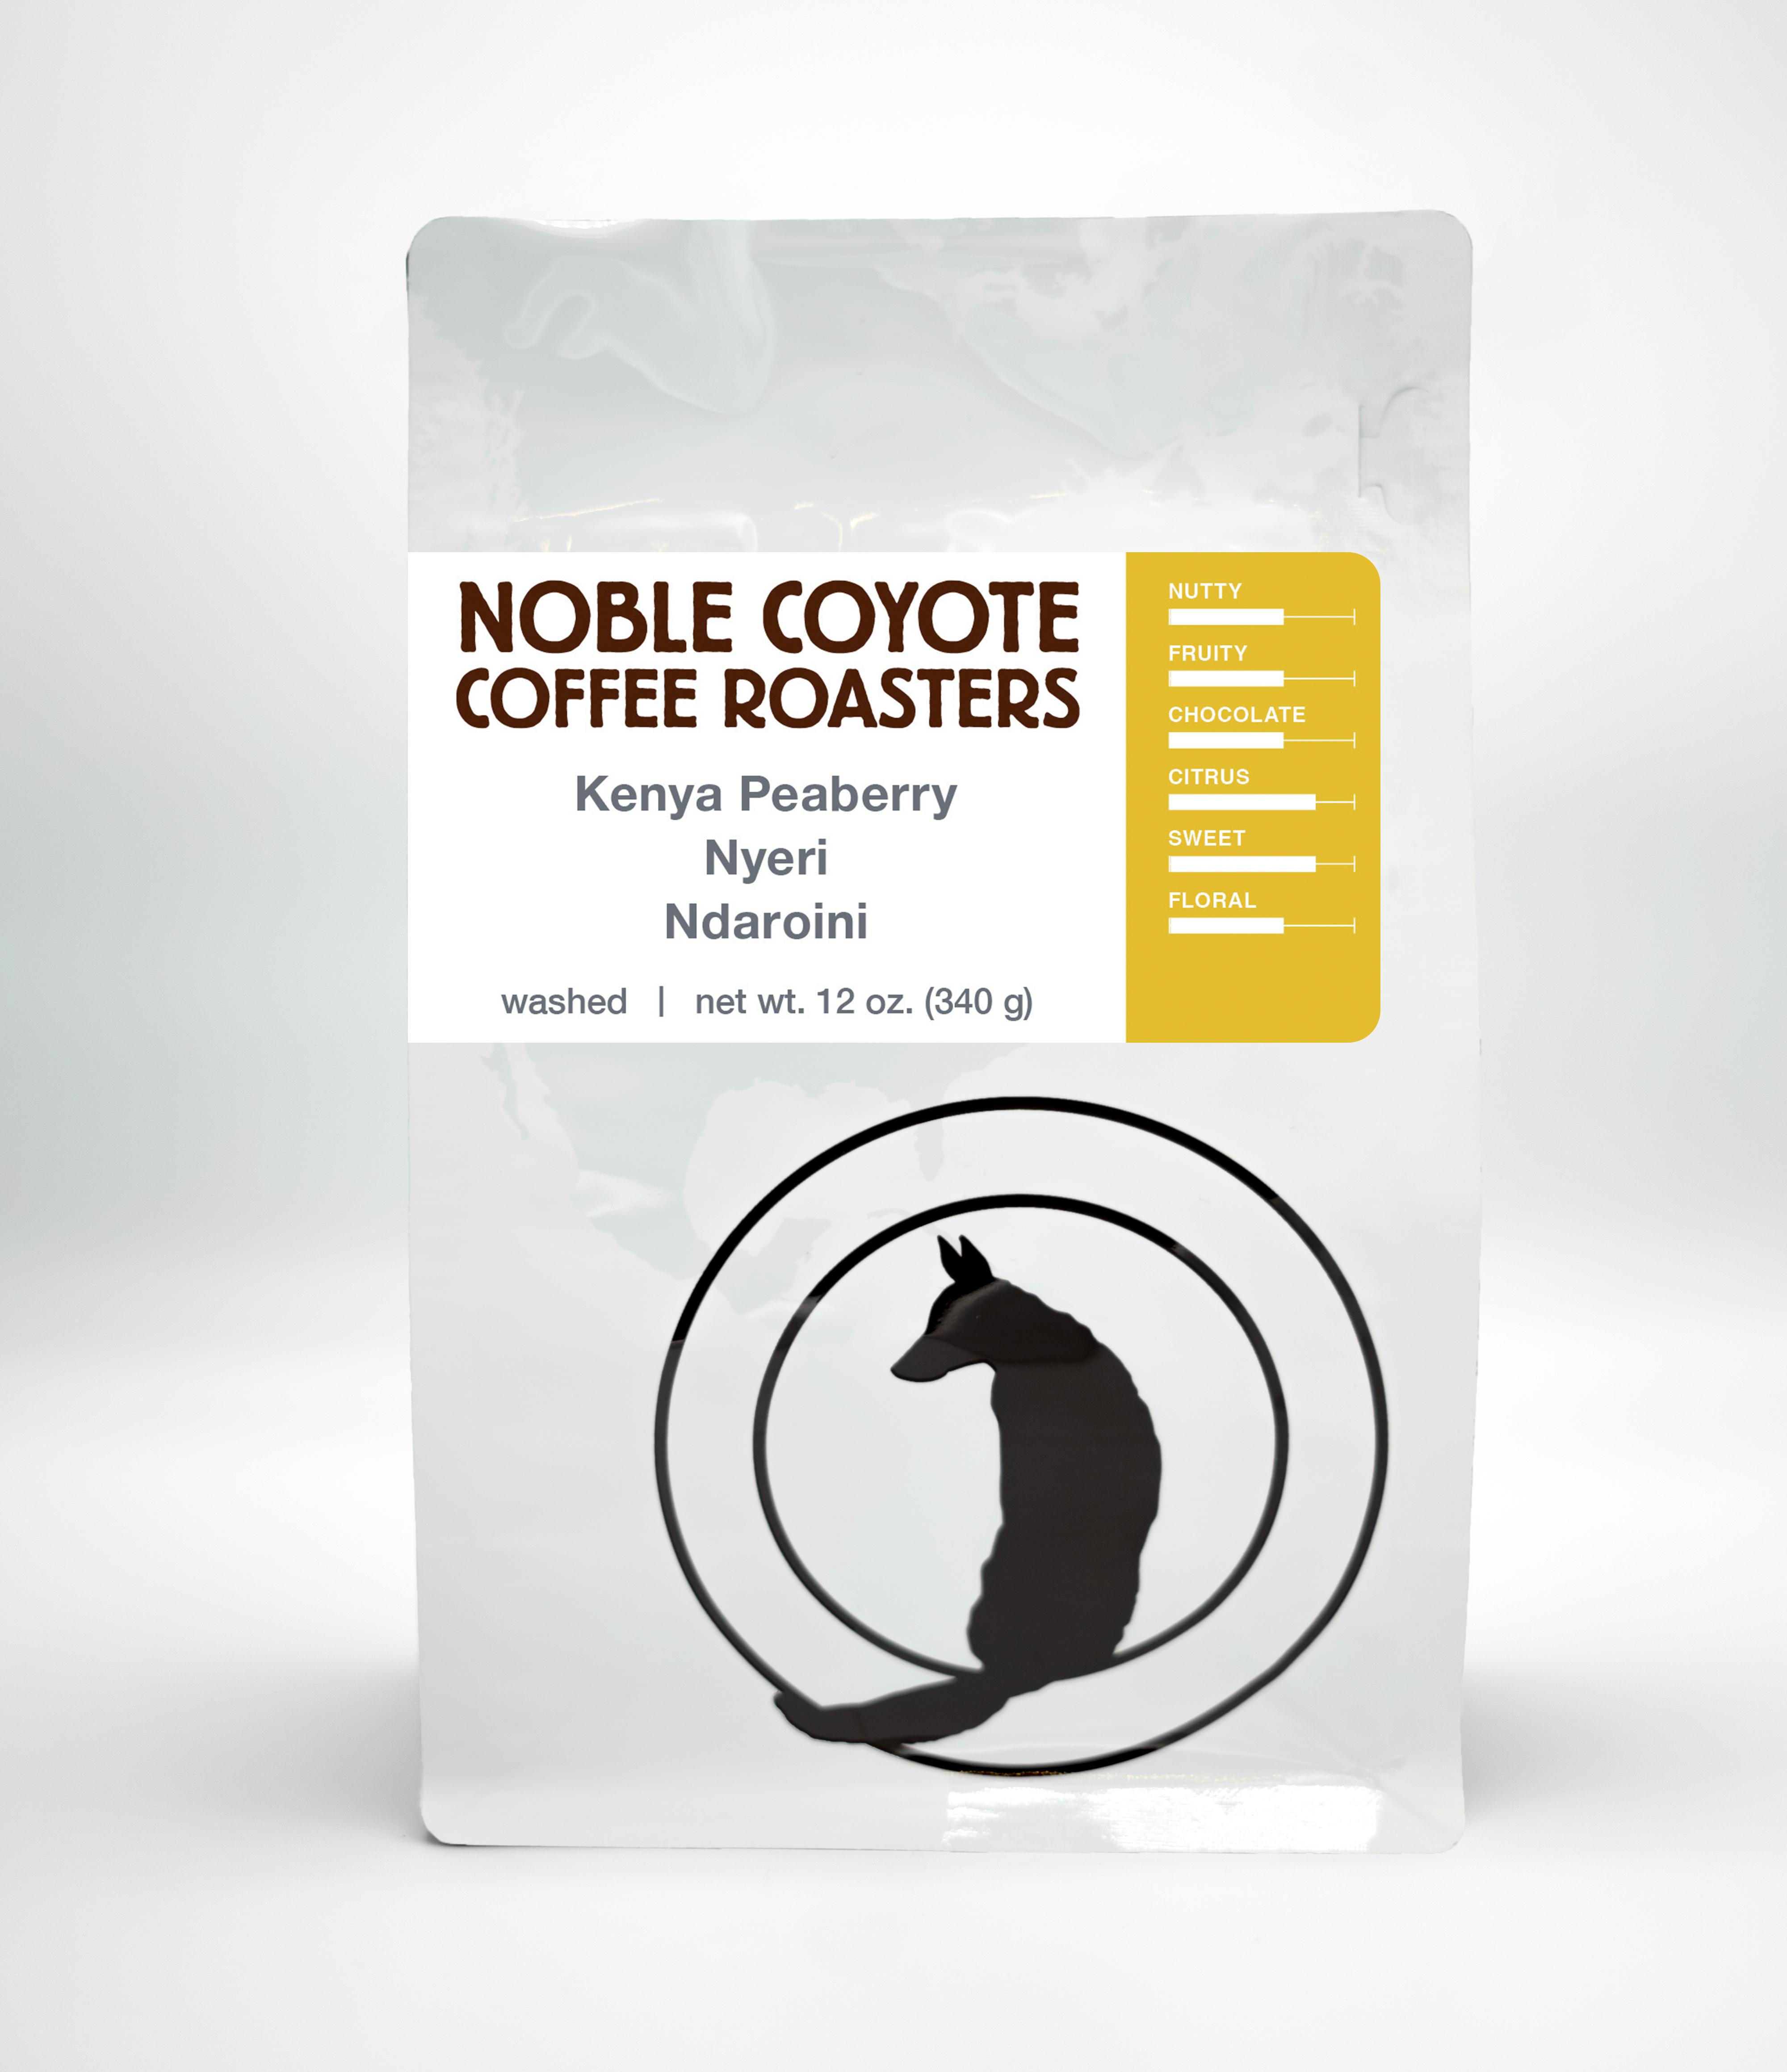 Kenya Ndaroini Peaberry from Noble Coyote Coffee Roasters